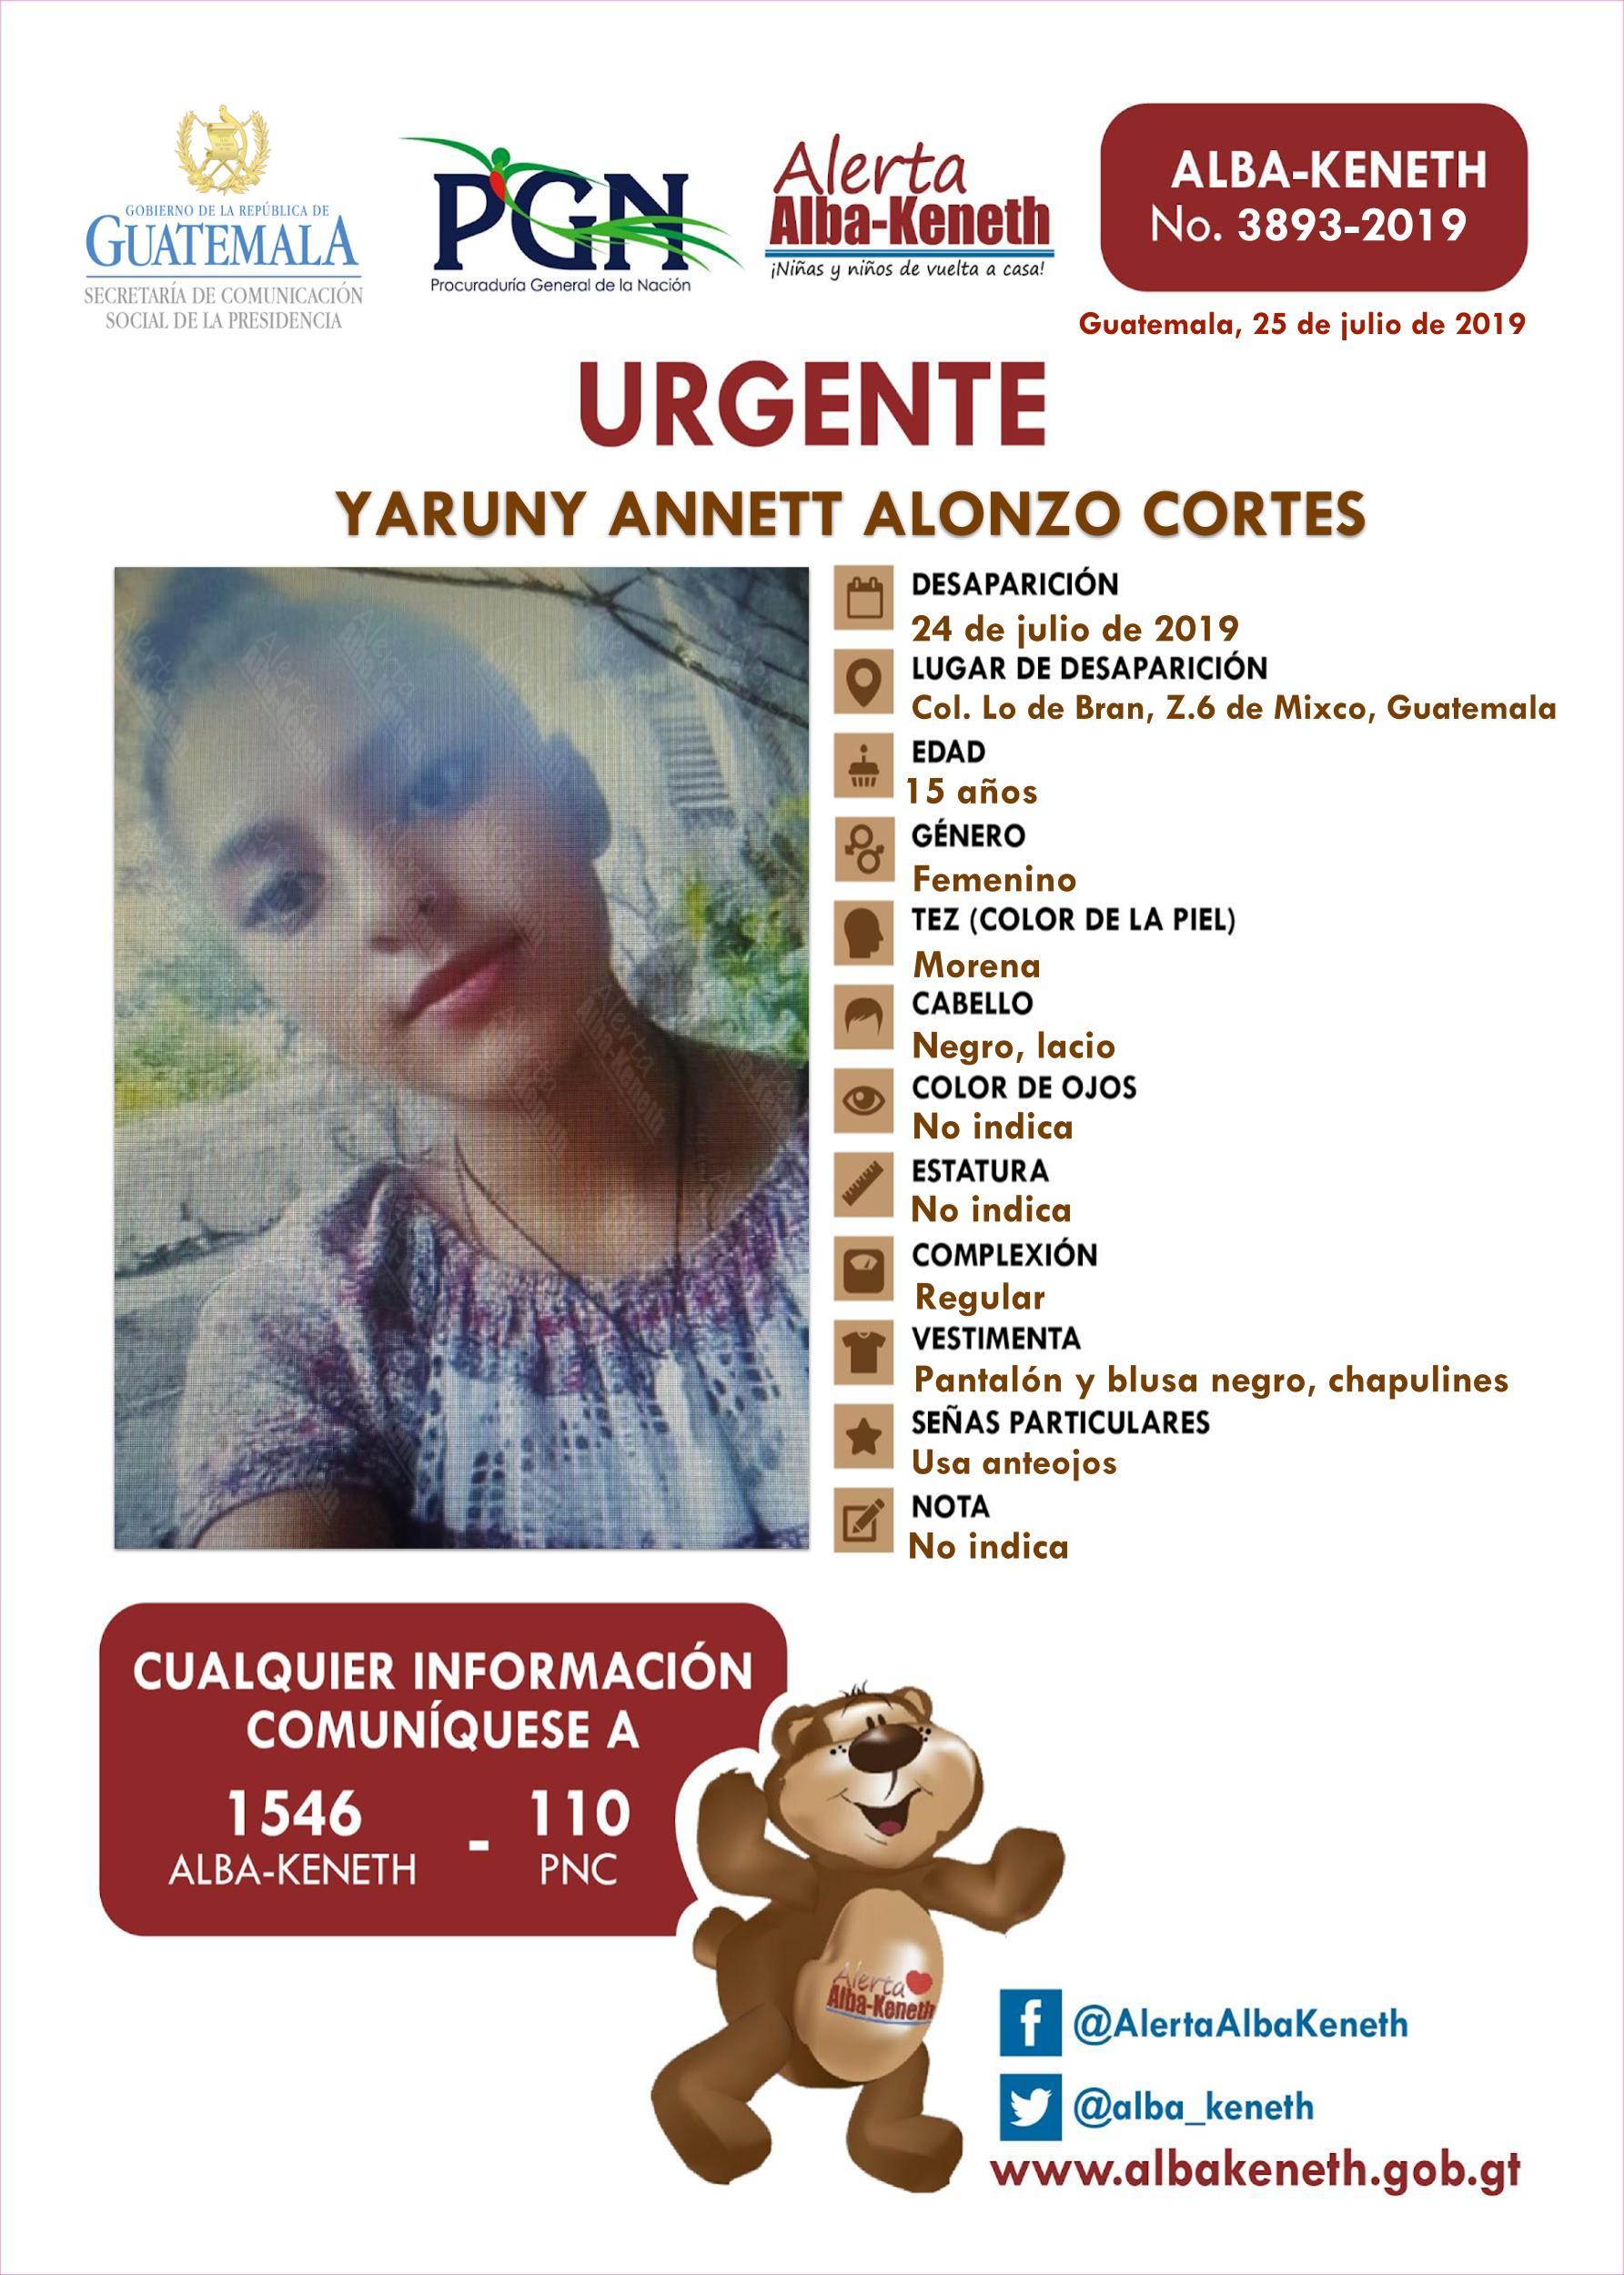 Yaruny Annett Alonzo Cortes